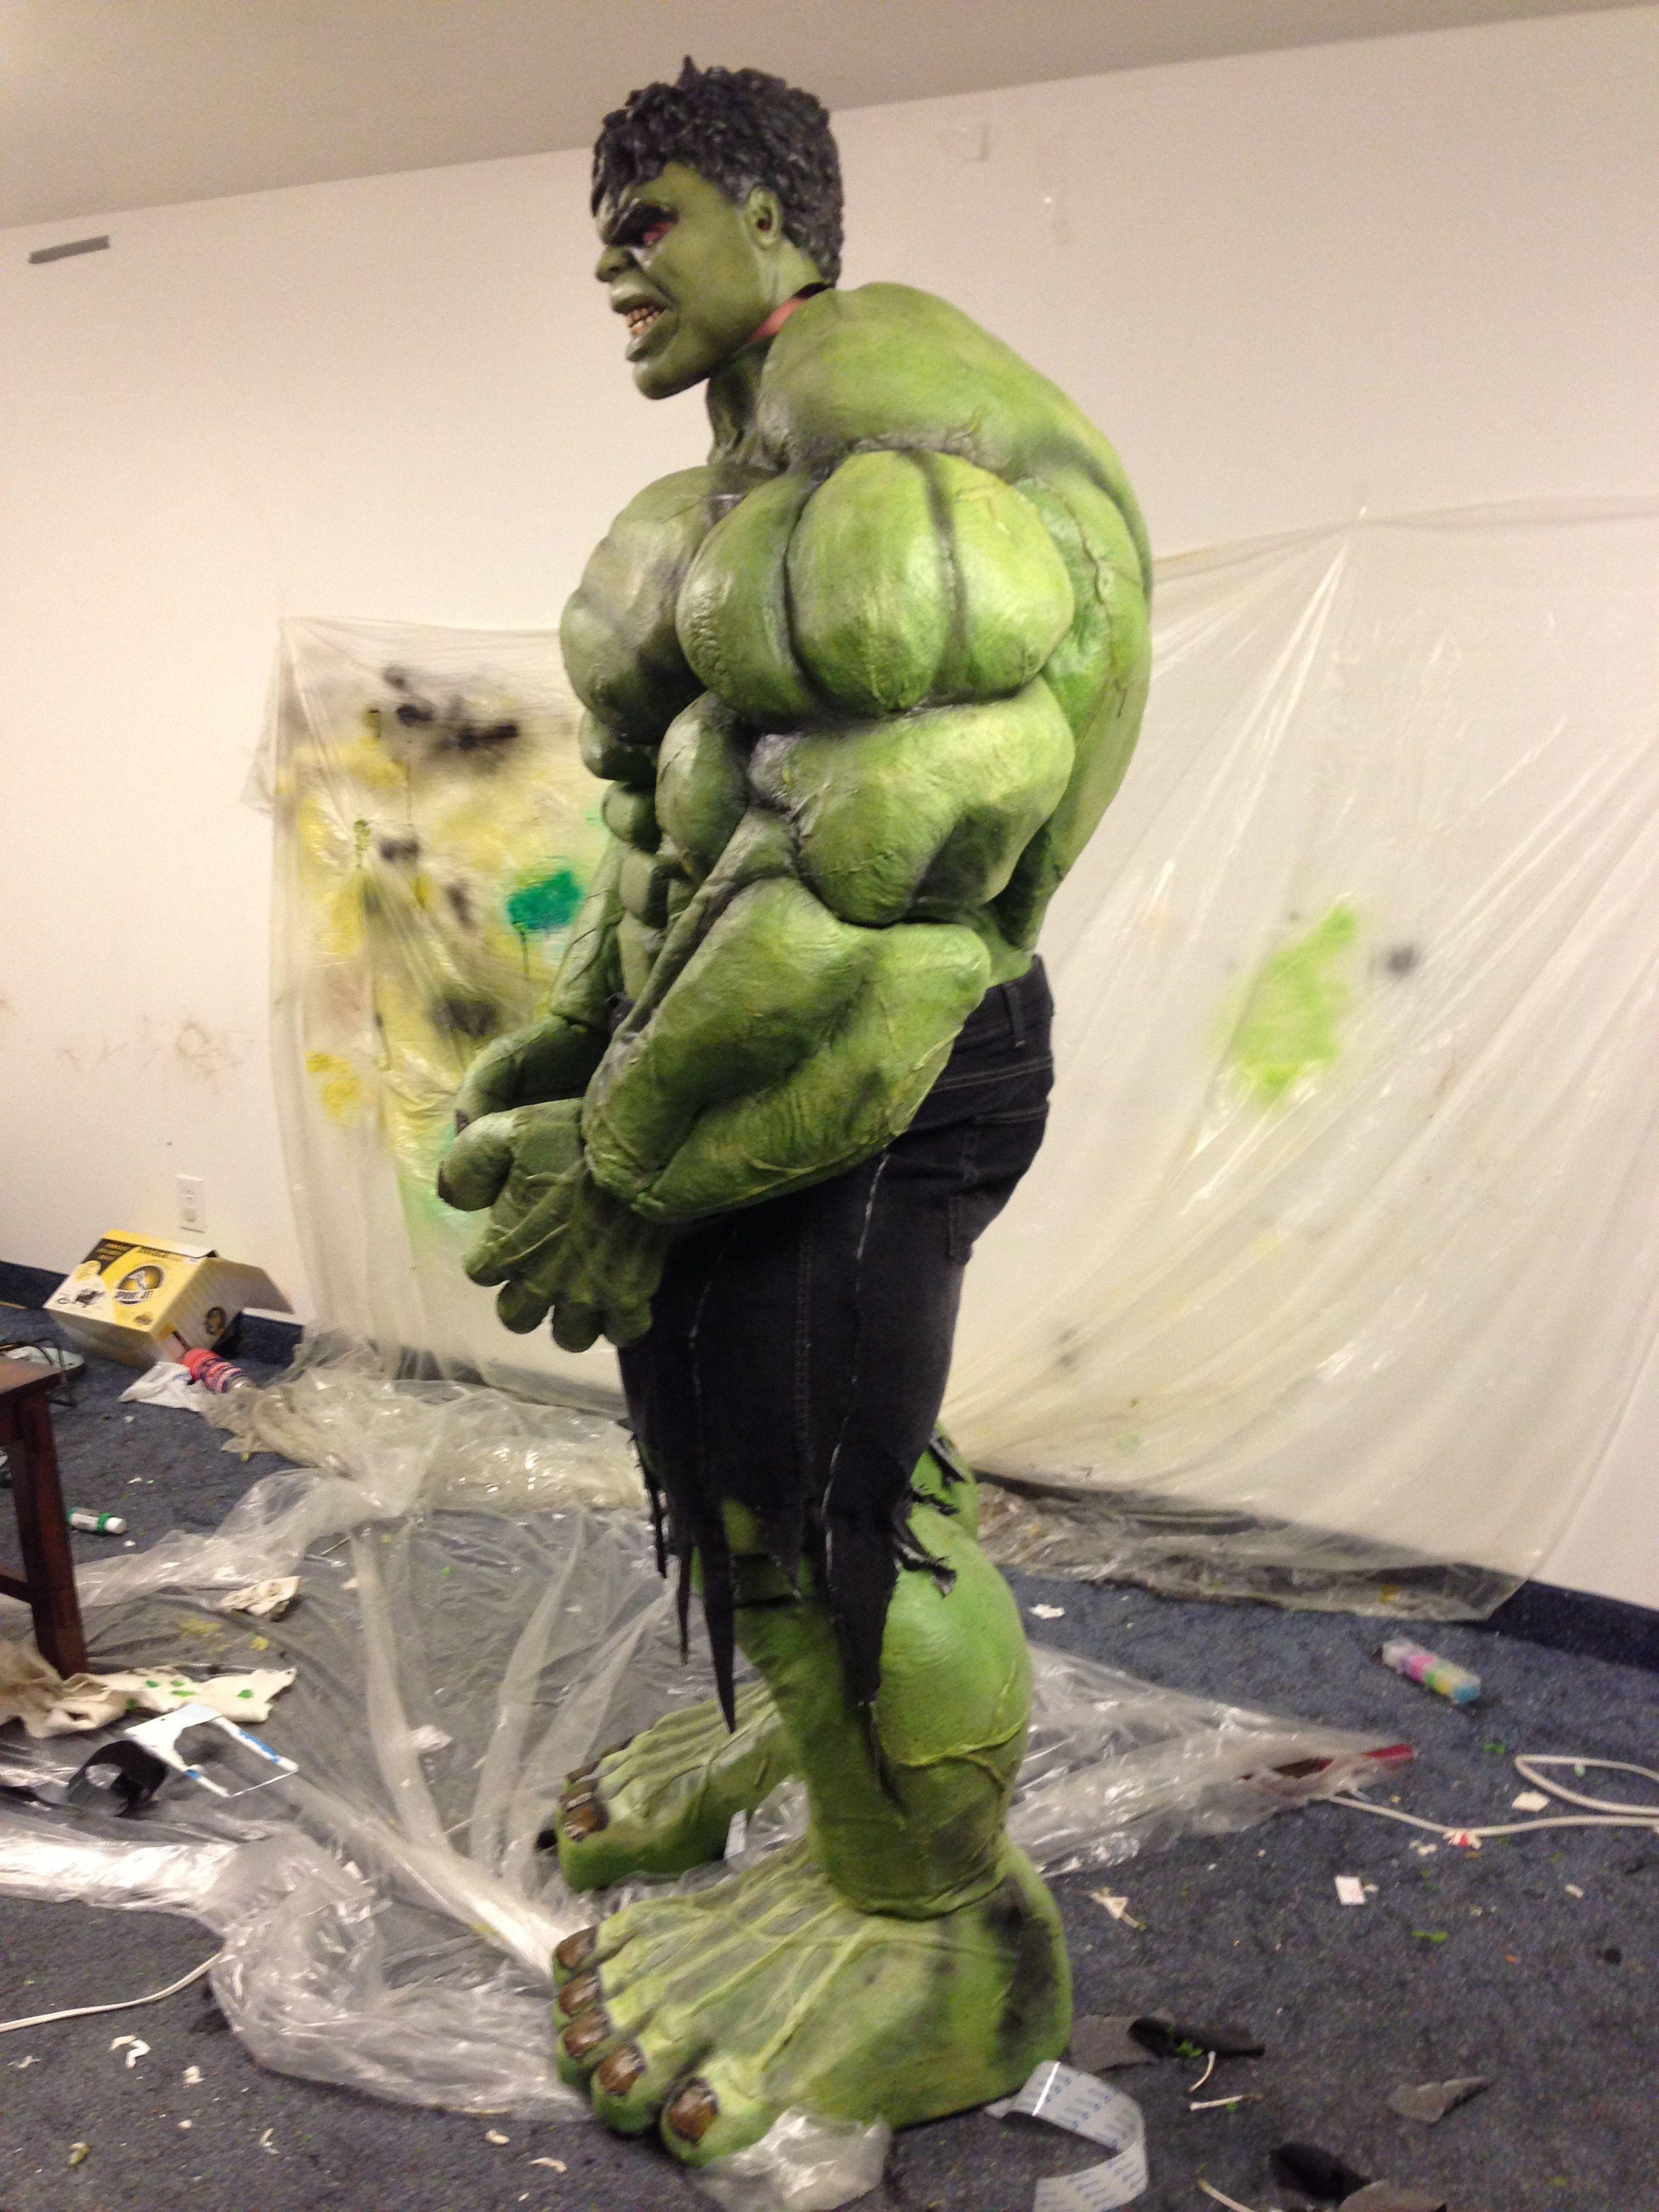 biopredators 2012 halloween costume contest entry incredible hulk